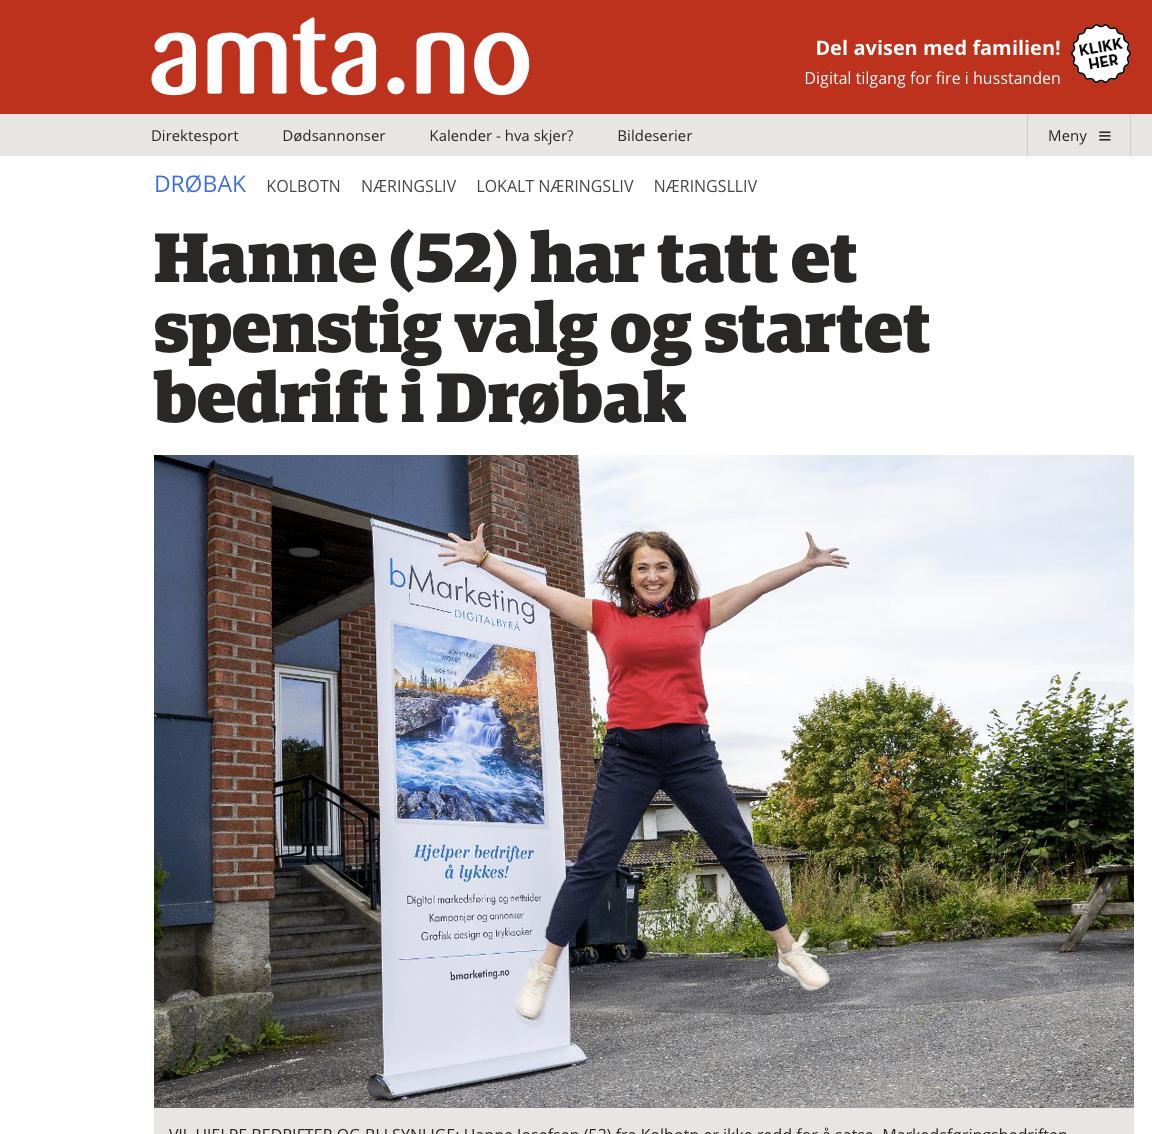 Hanne Josefsen hoppende foran bMarketing-skilt